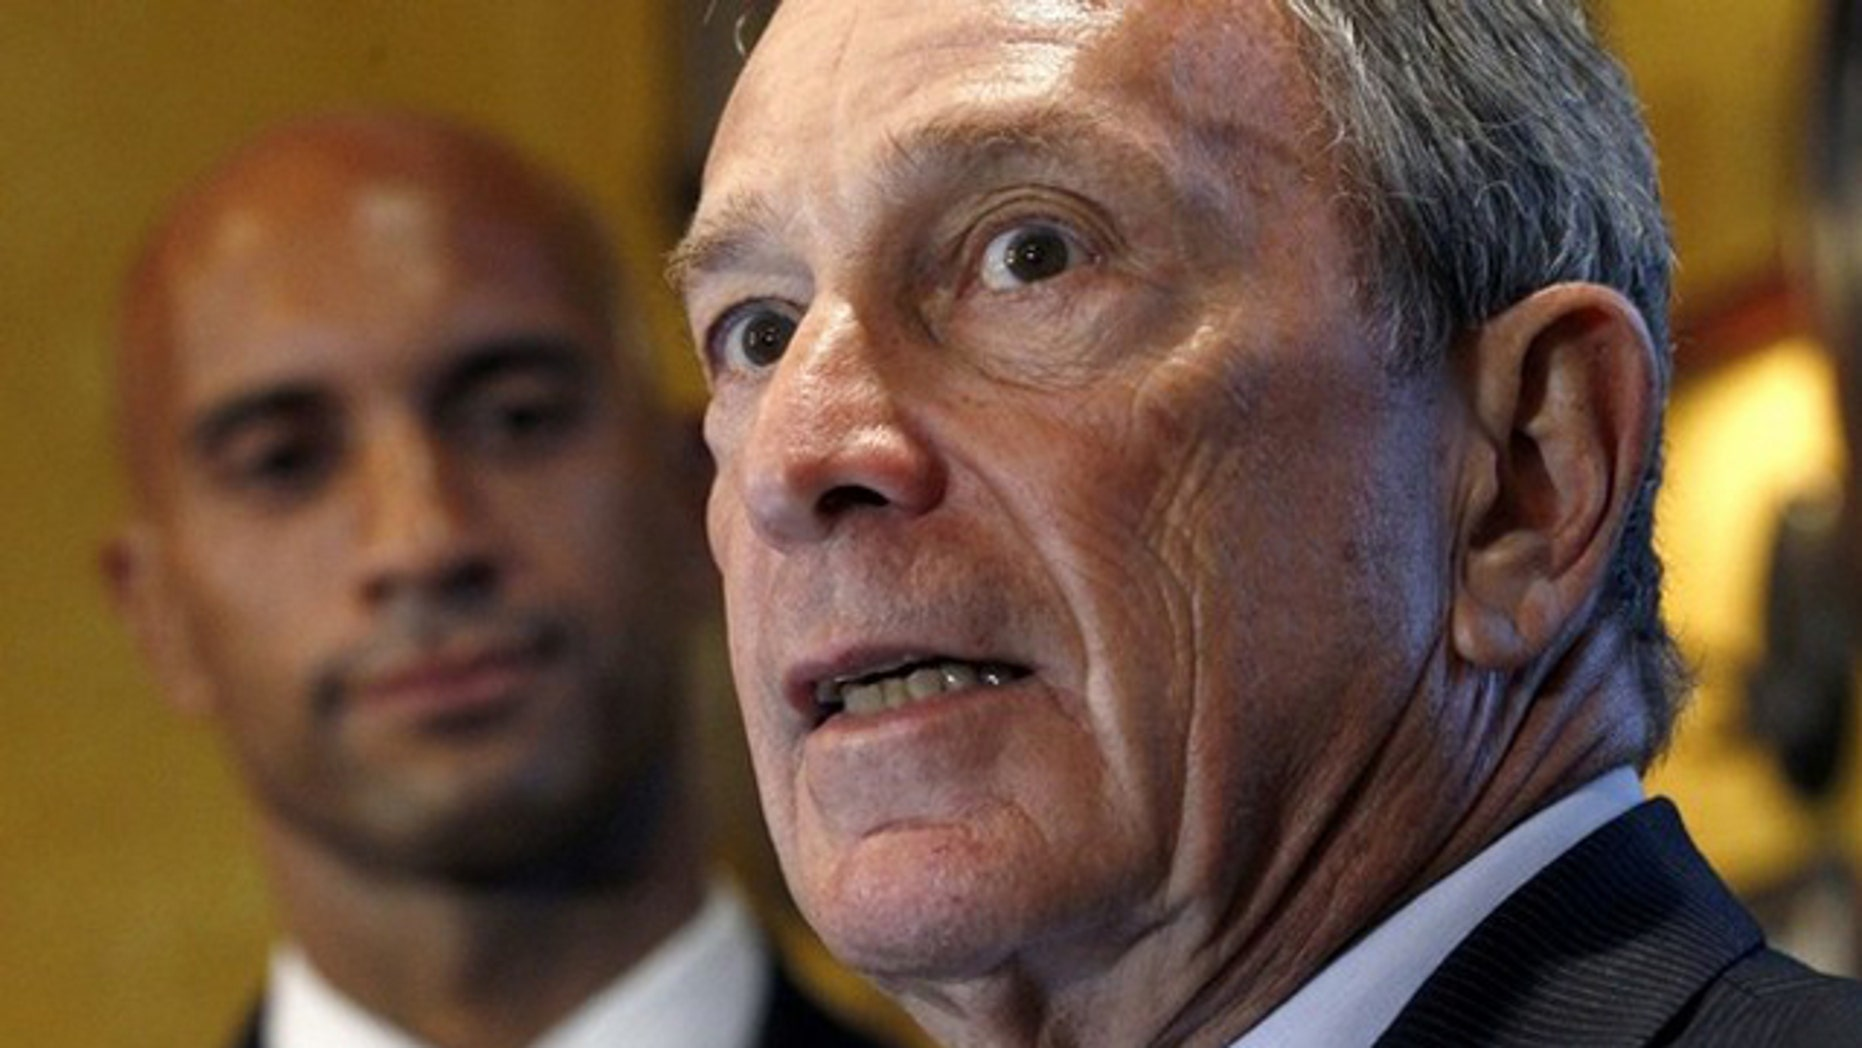 New York City Mayor Michael Bloomberg speaks during his endorsement of Washington D.C. Mayor Adrian Fenty in Washington Aug. 17. (Reuters Photo)